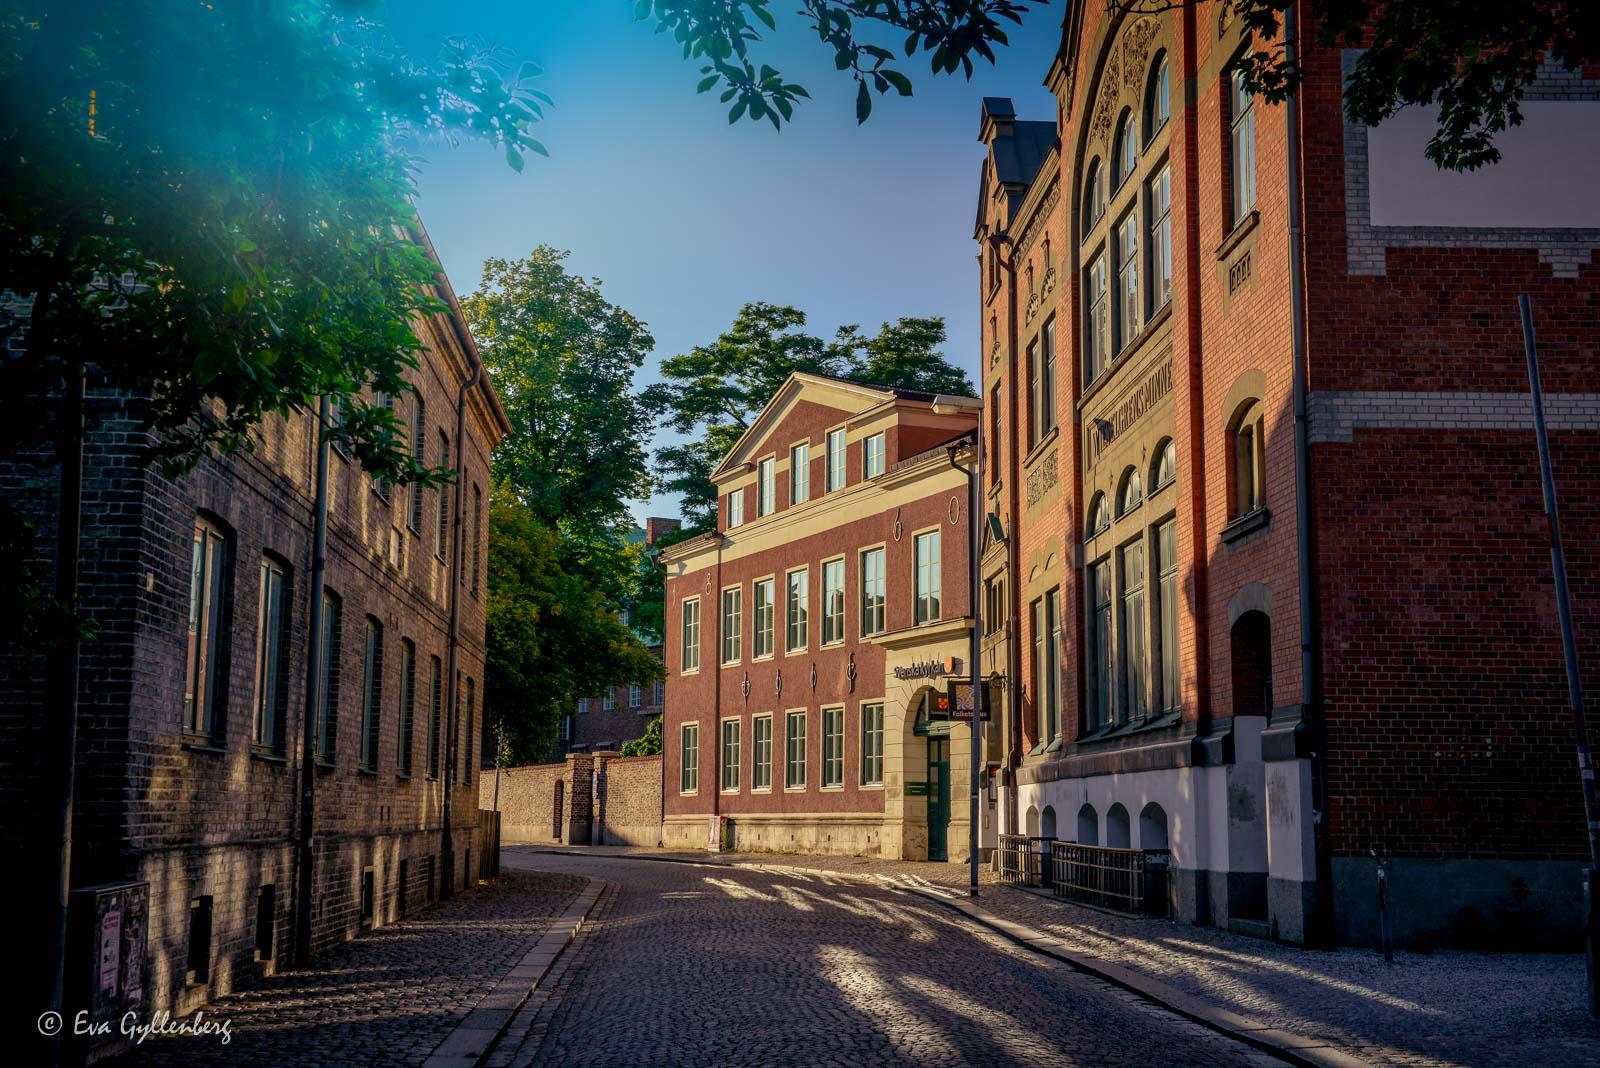 Gata i Lund